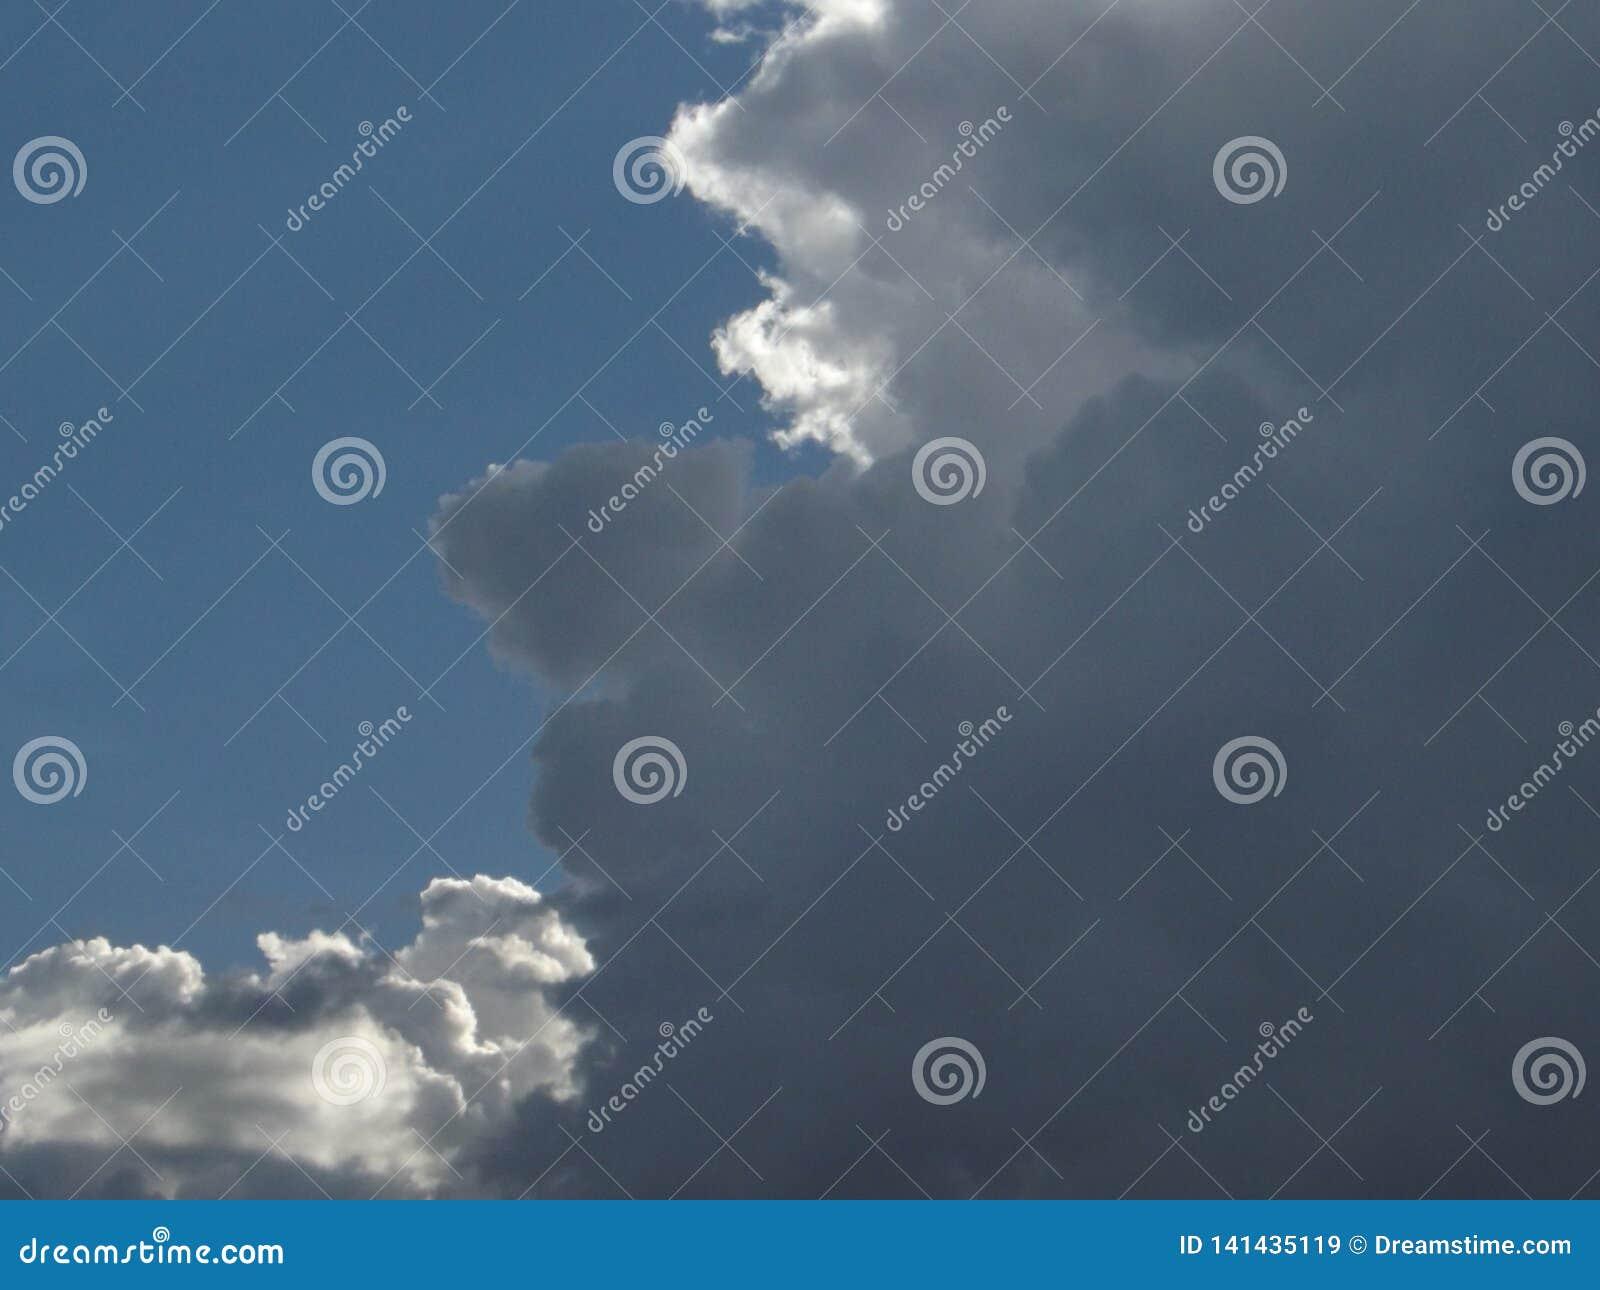 Mexican cloudy skyline